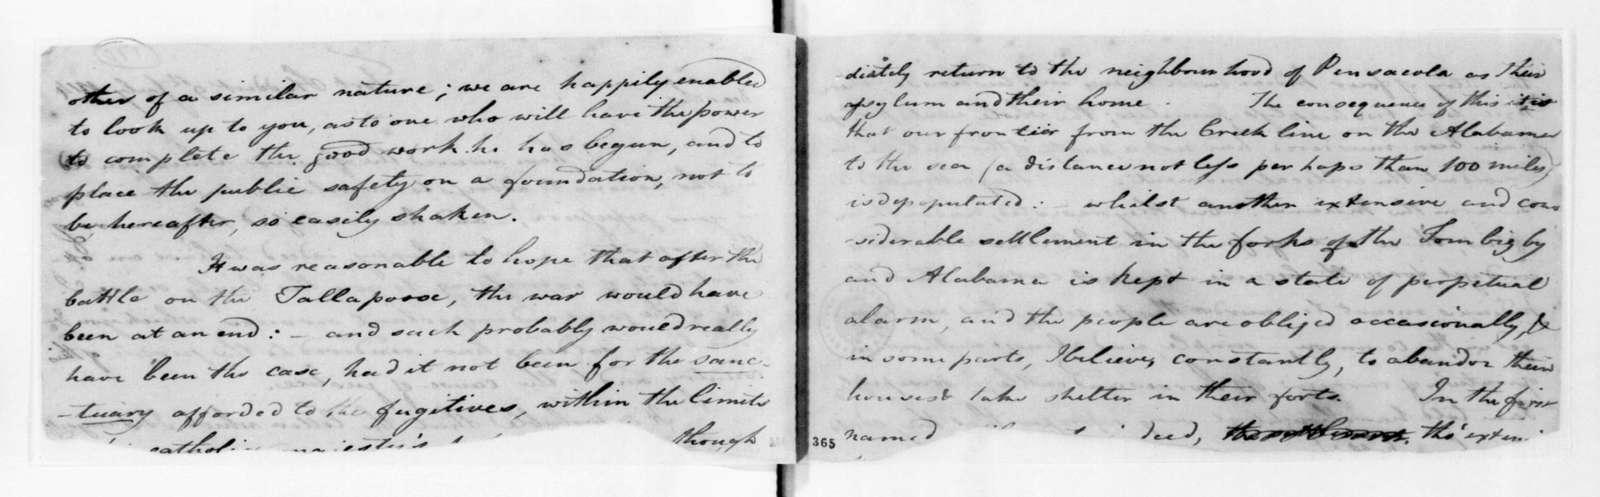 David Holmes to Andrew Jackson, July 9, 1814